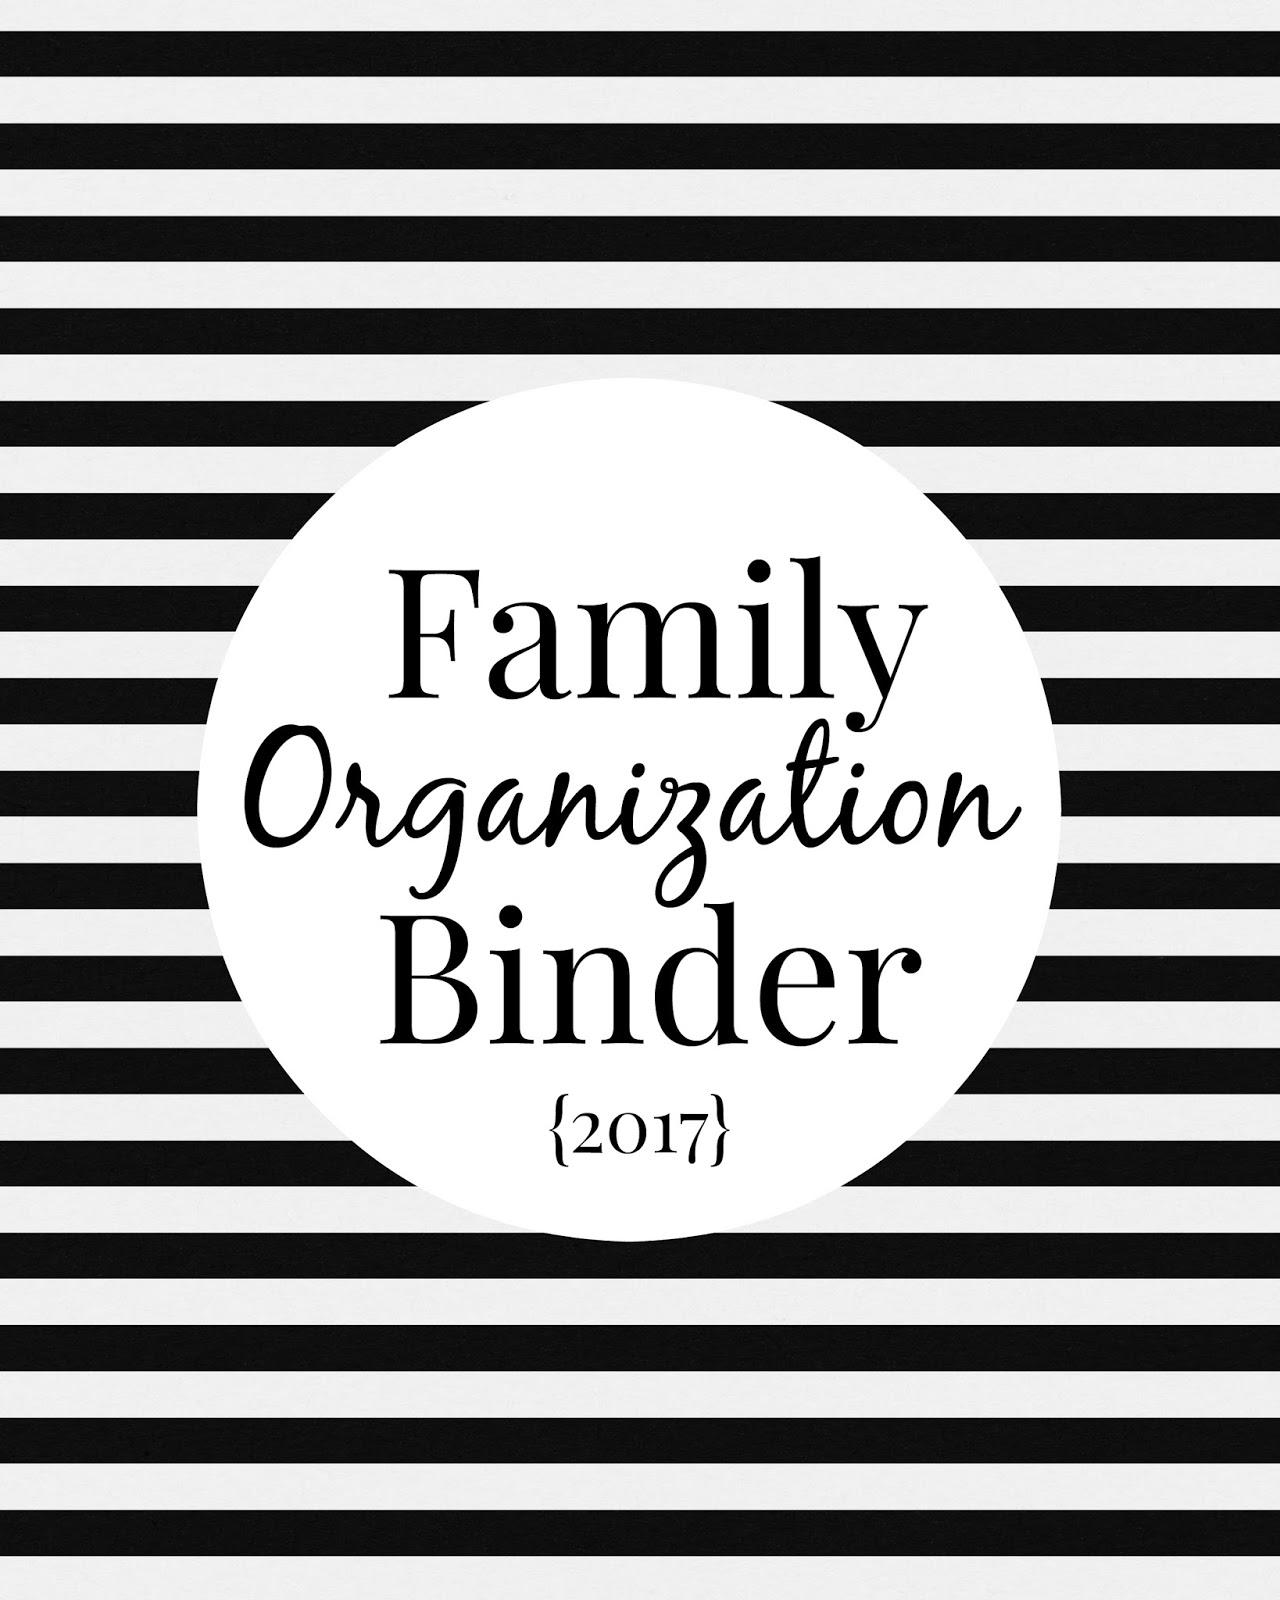 binder cover creator